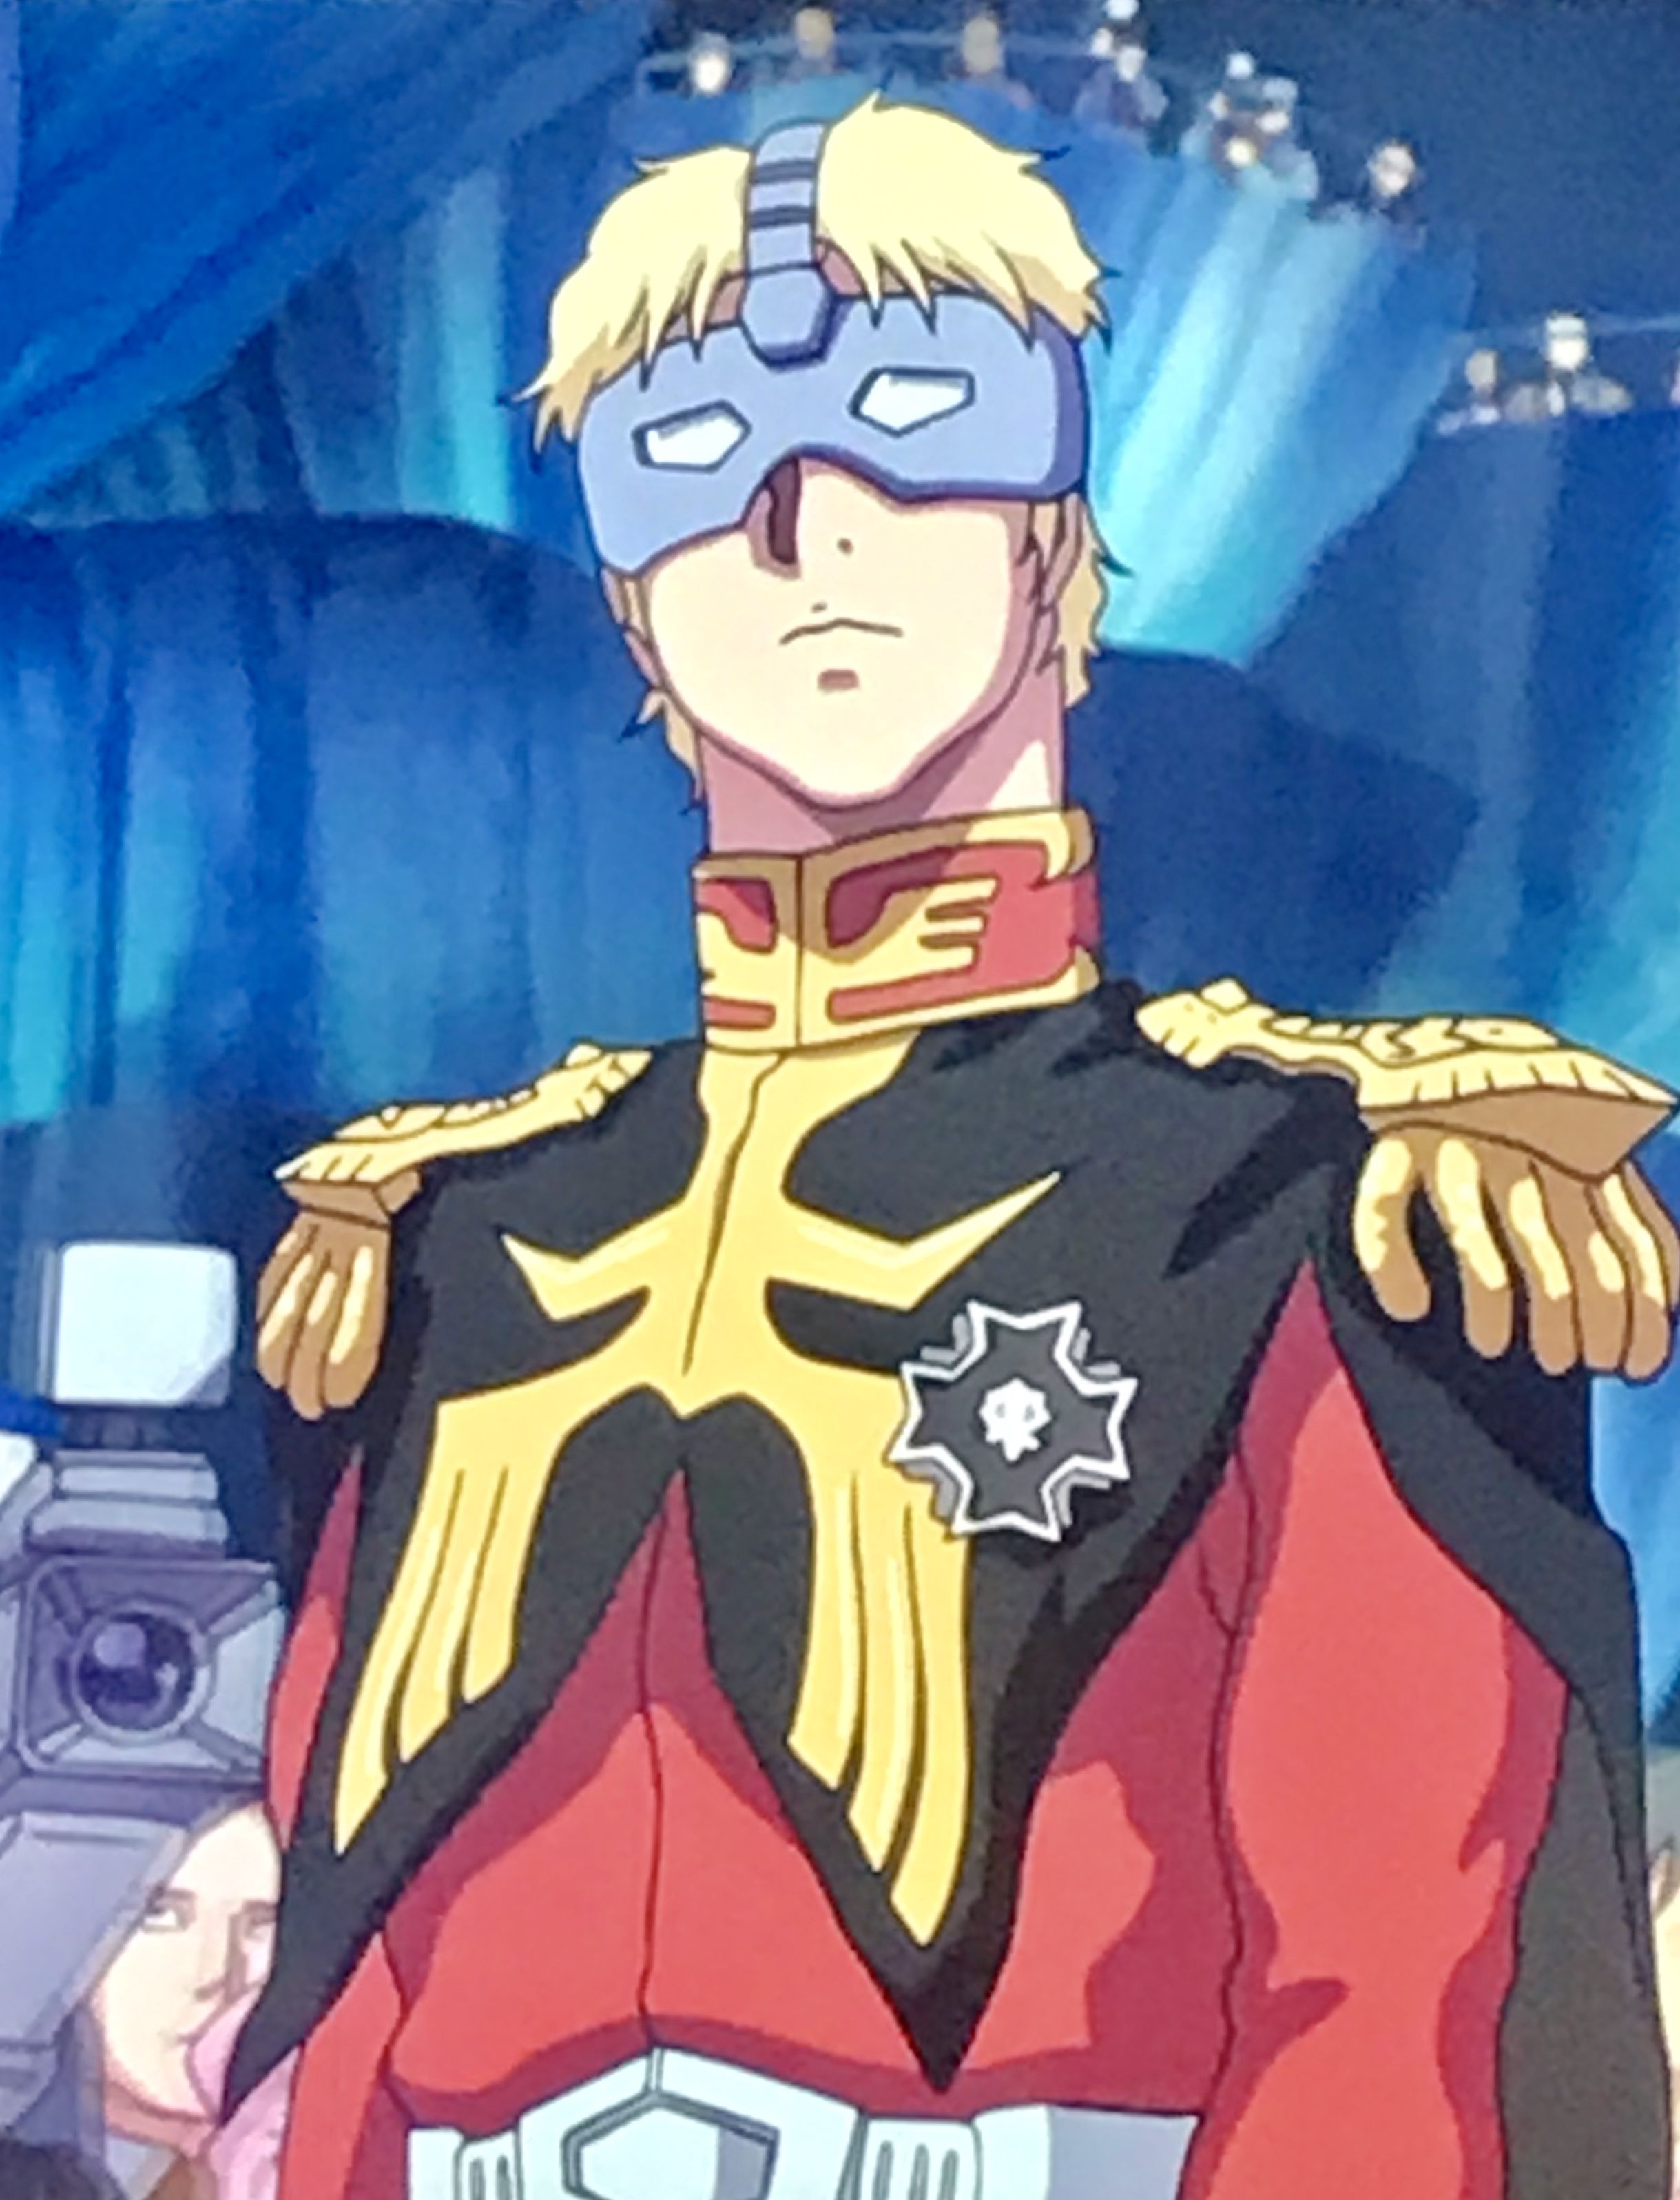 Mobile Suit Gundam The Origin 機動戦士ガンダム The Origin おしゃれまとめの人気アイデア Pinterest Mikazuki ガンダム シャア専用 壁紙